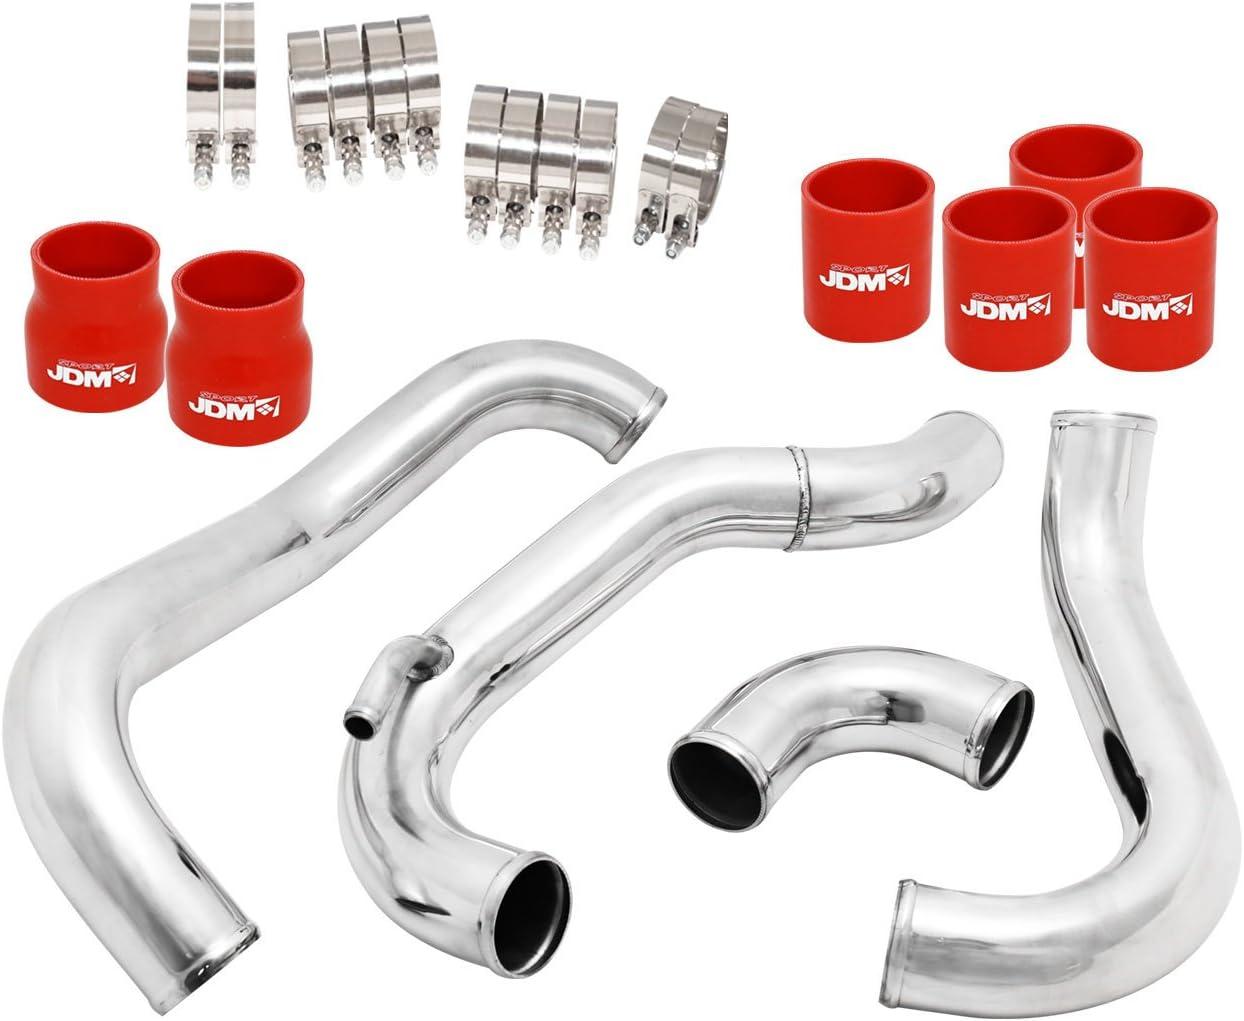 Quality inspection AJP Distributors Replacement High Turbo Racing Charg half Performance